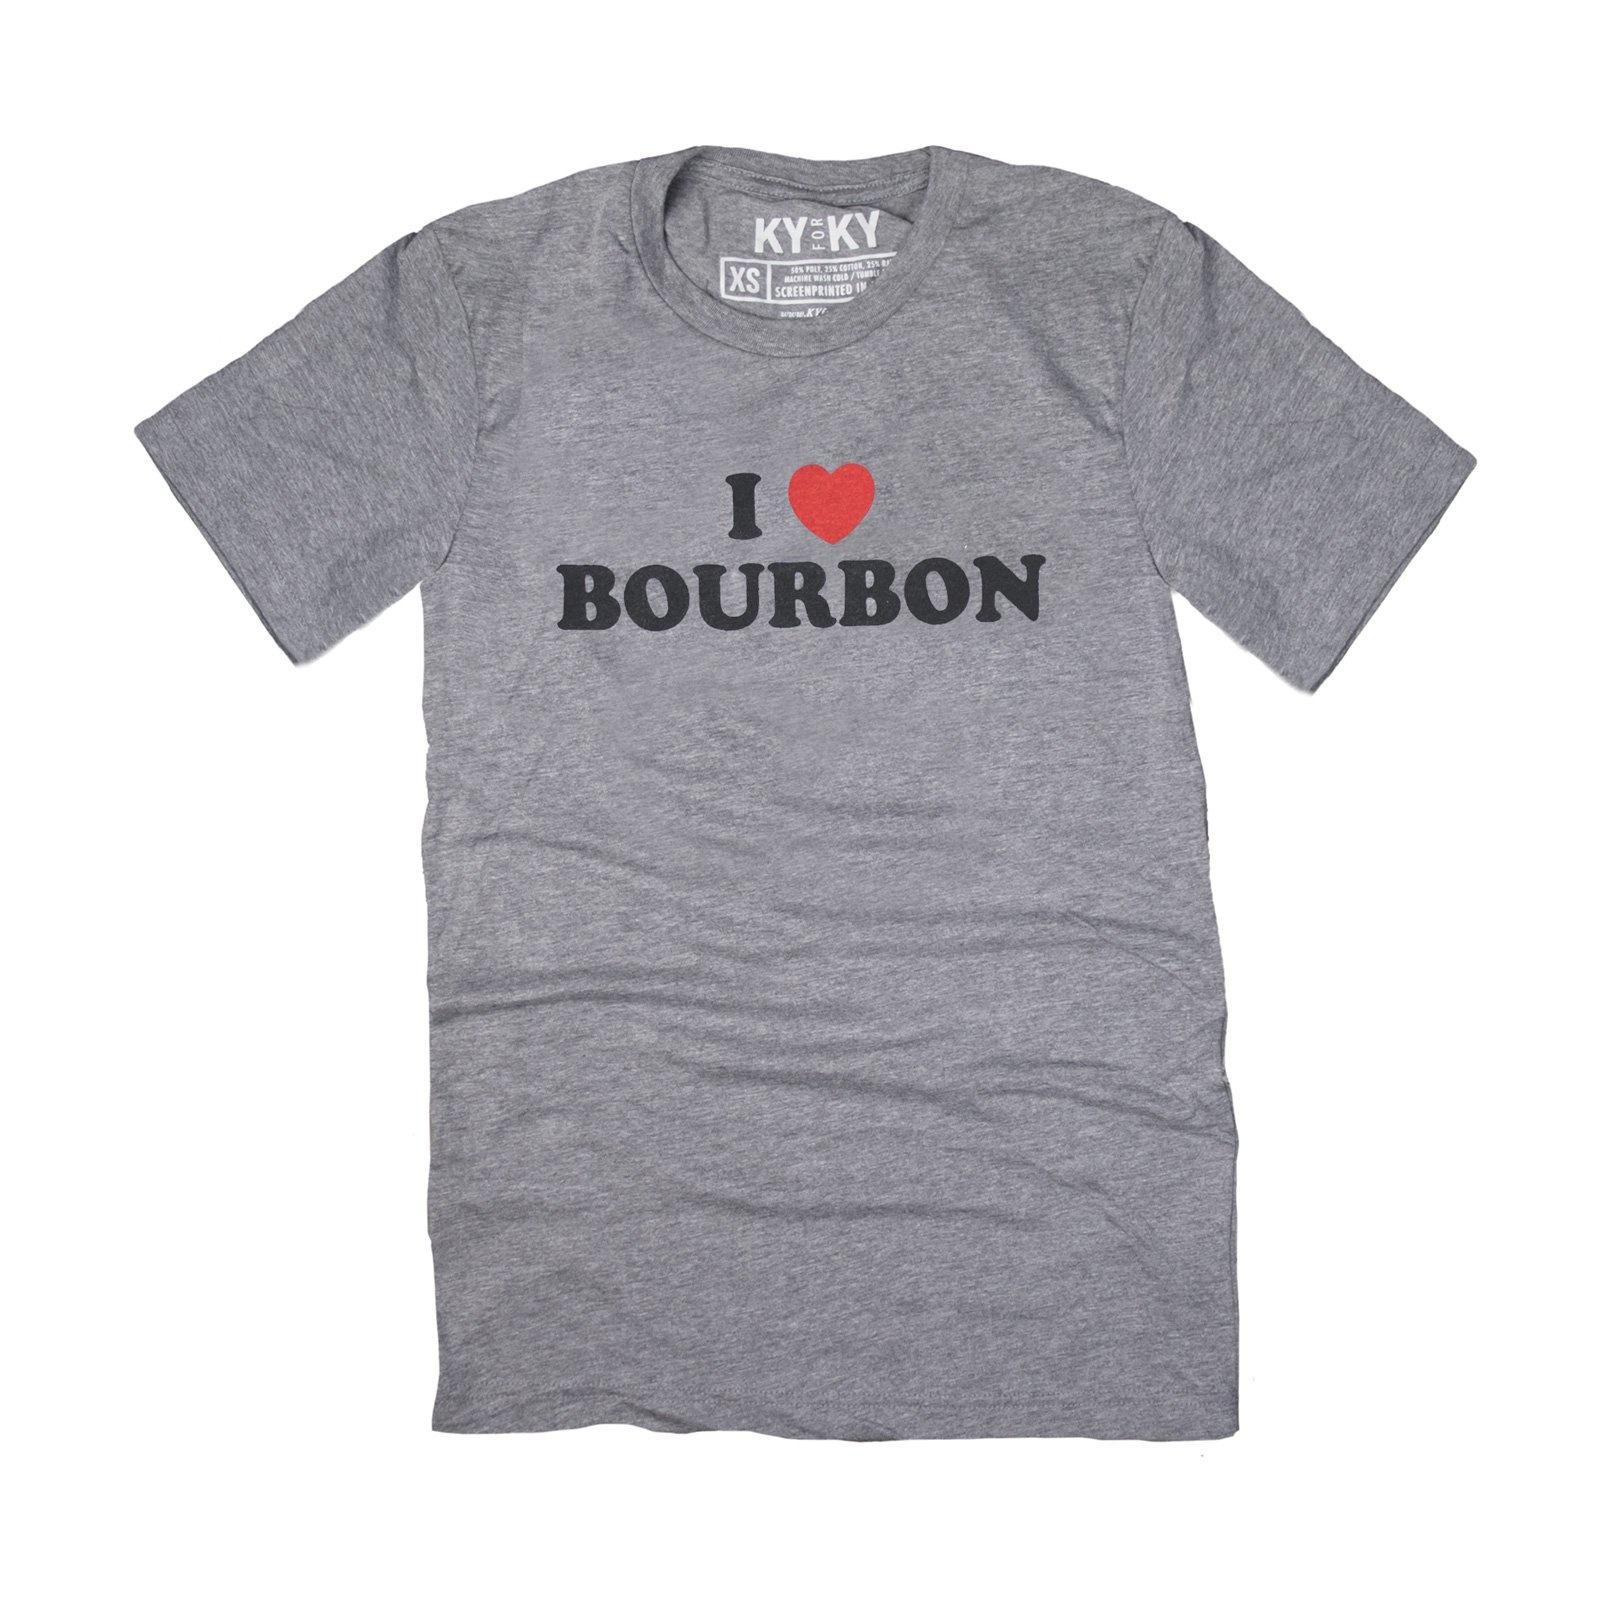 KY for KY I Heart Bourbon Tee